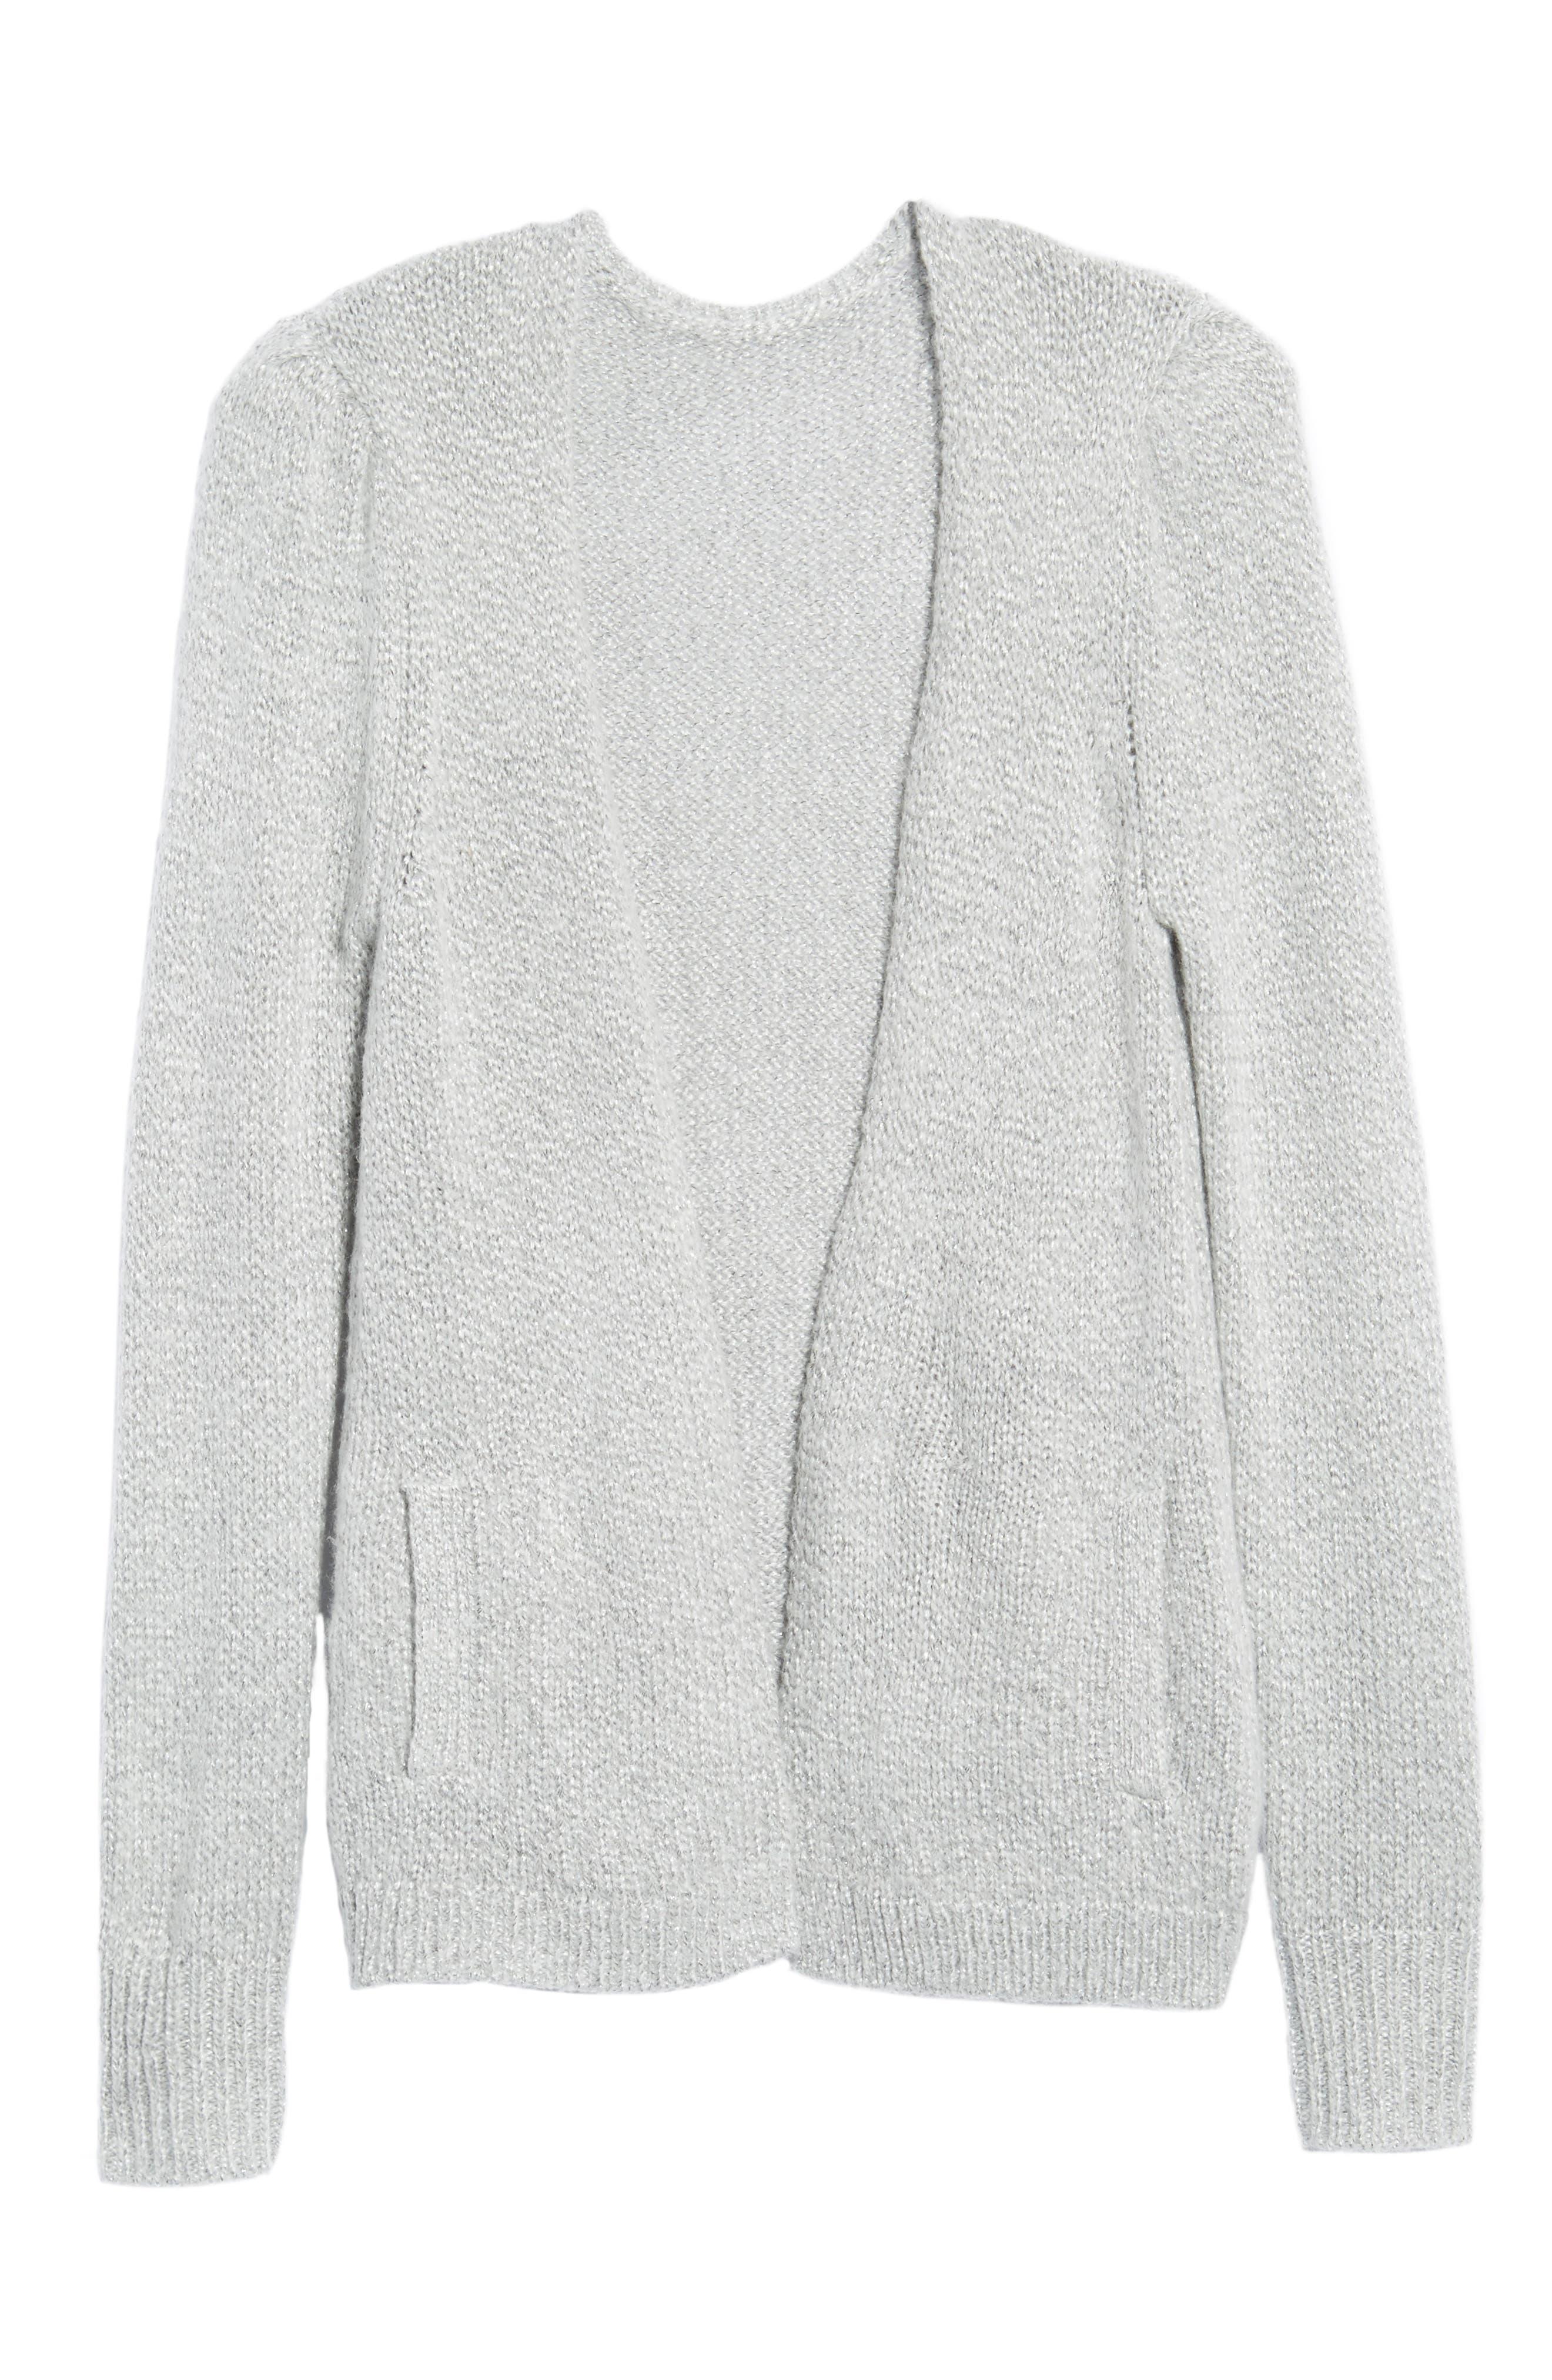 Shine Cardigan Sweater,                             Alternate thumbnail 6, color,                             020